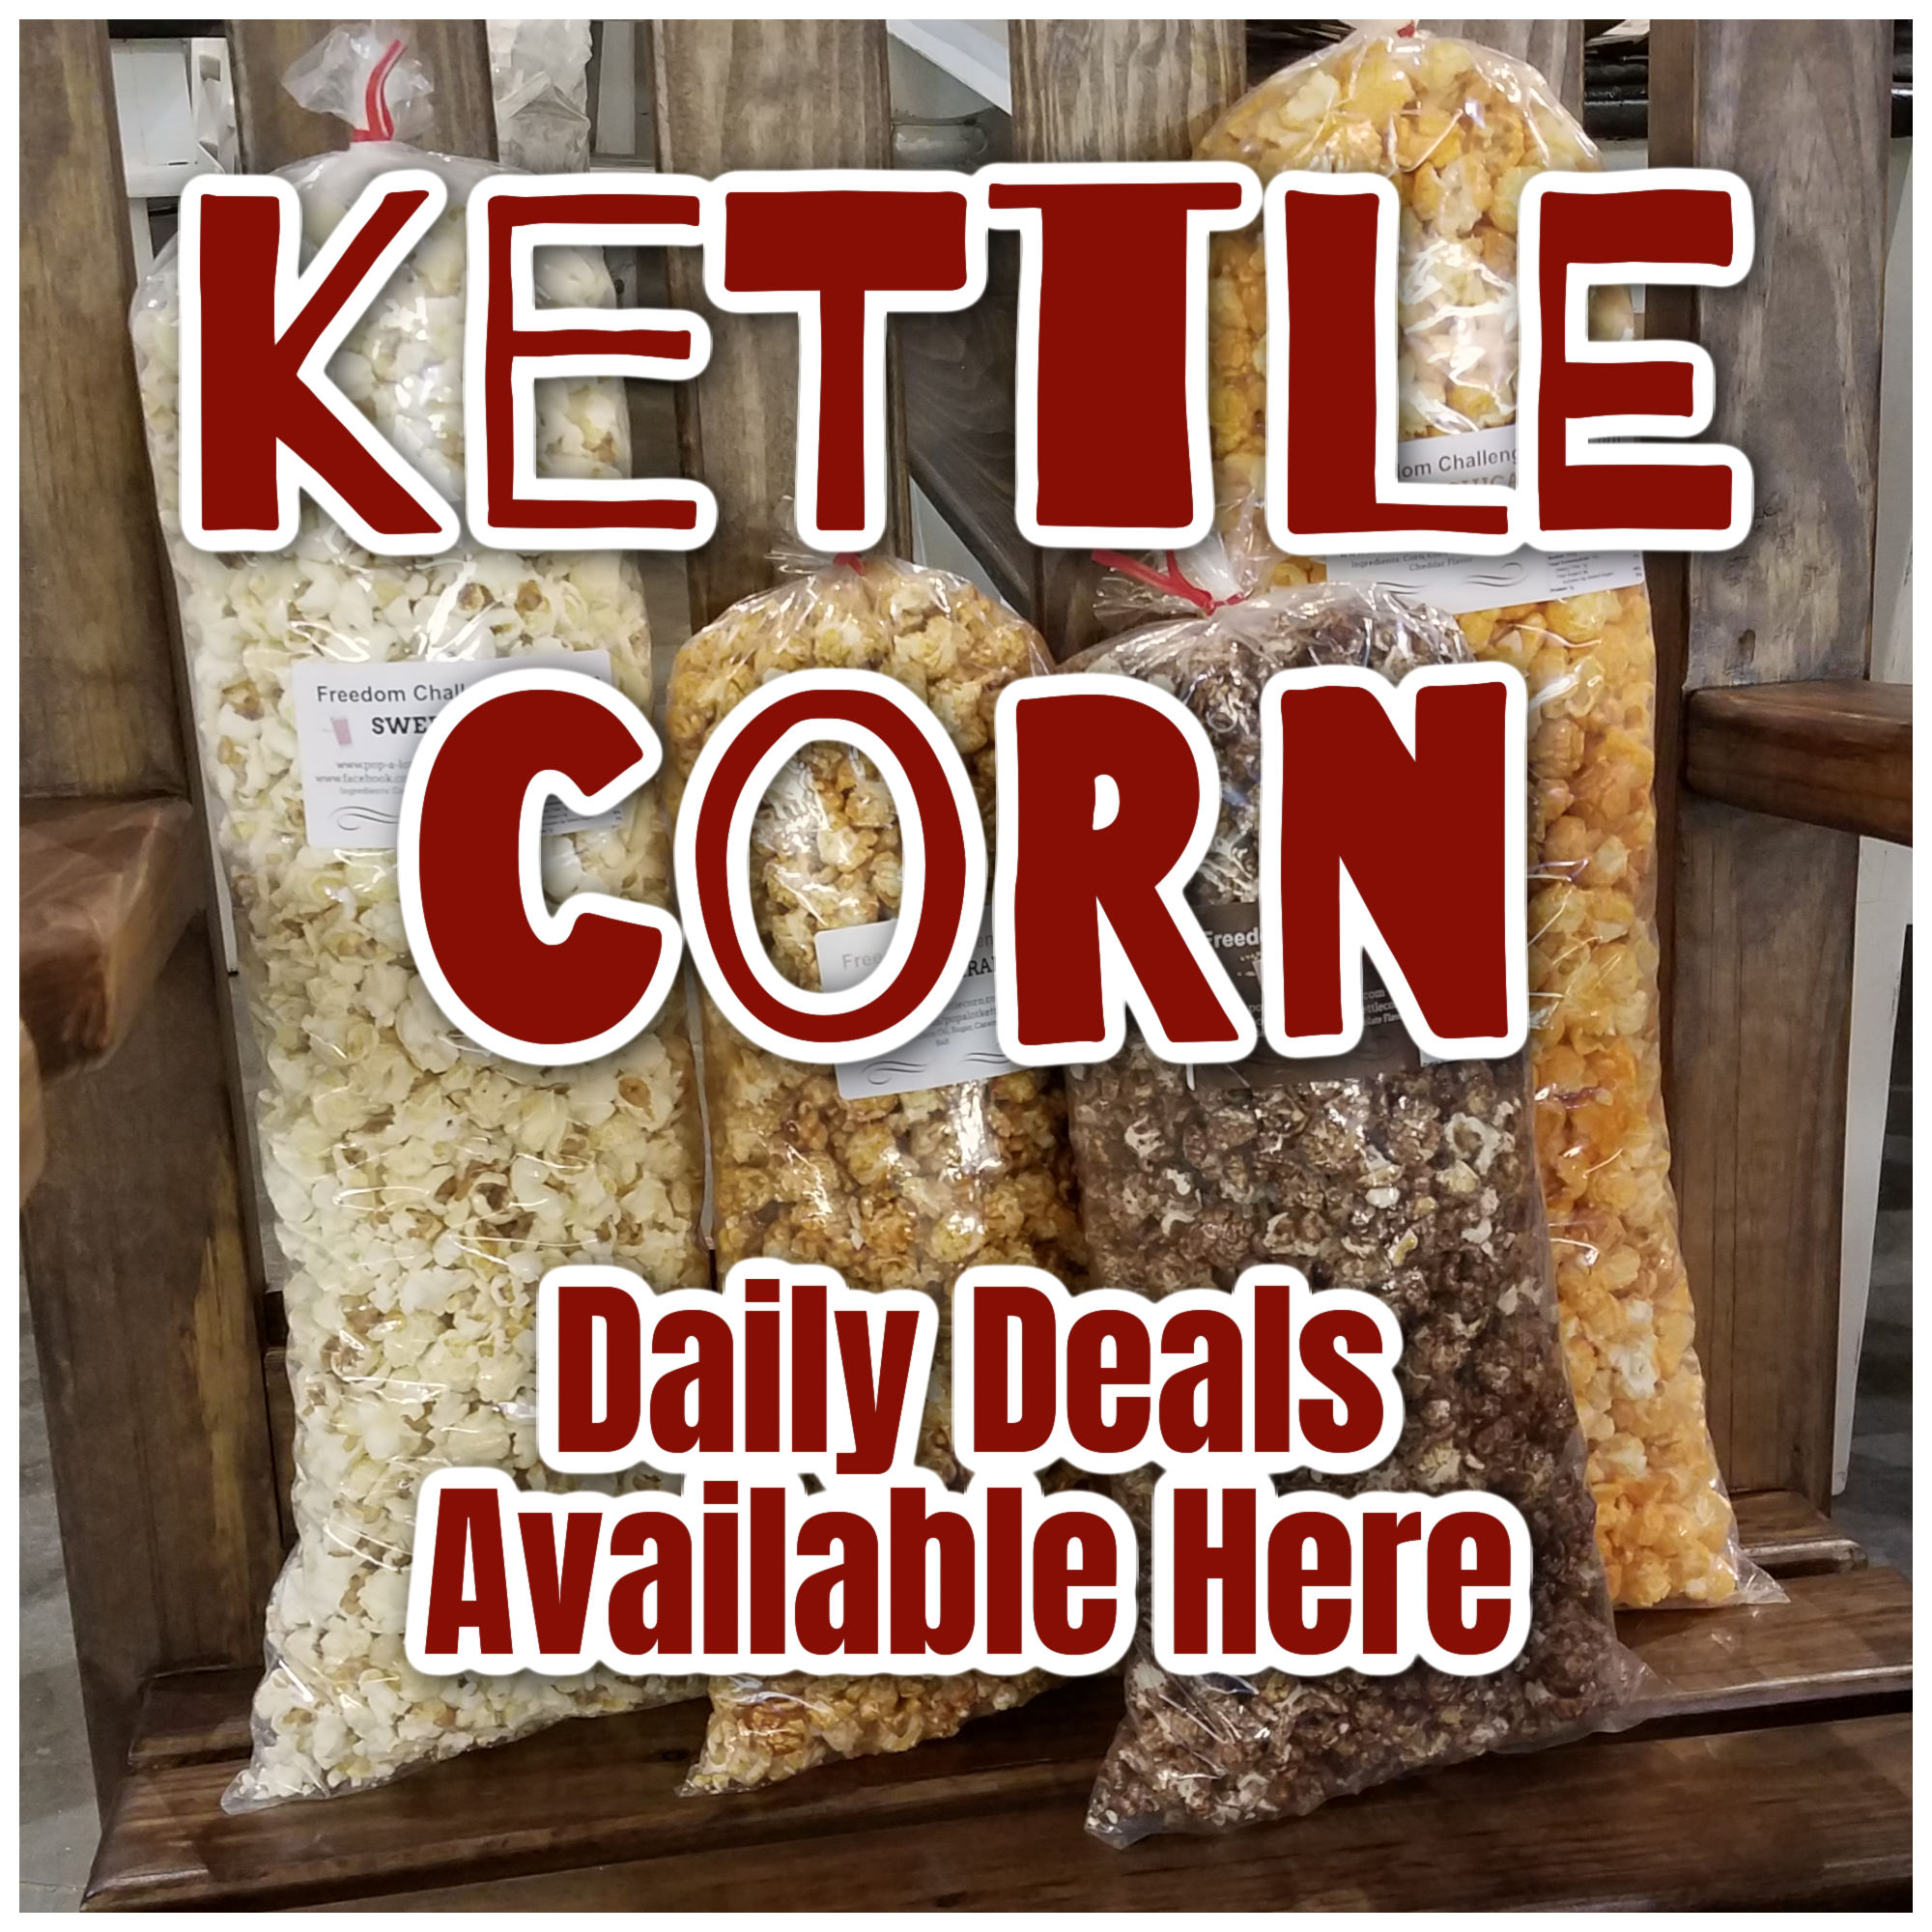 Kettle Corn 40% Off Sale!